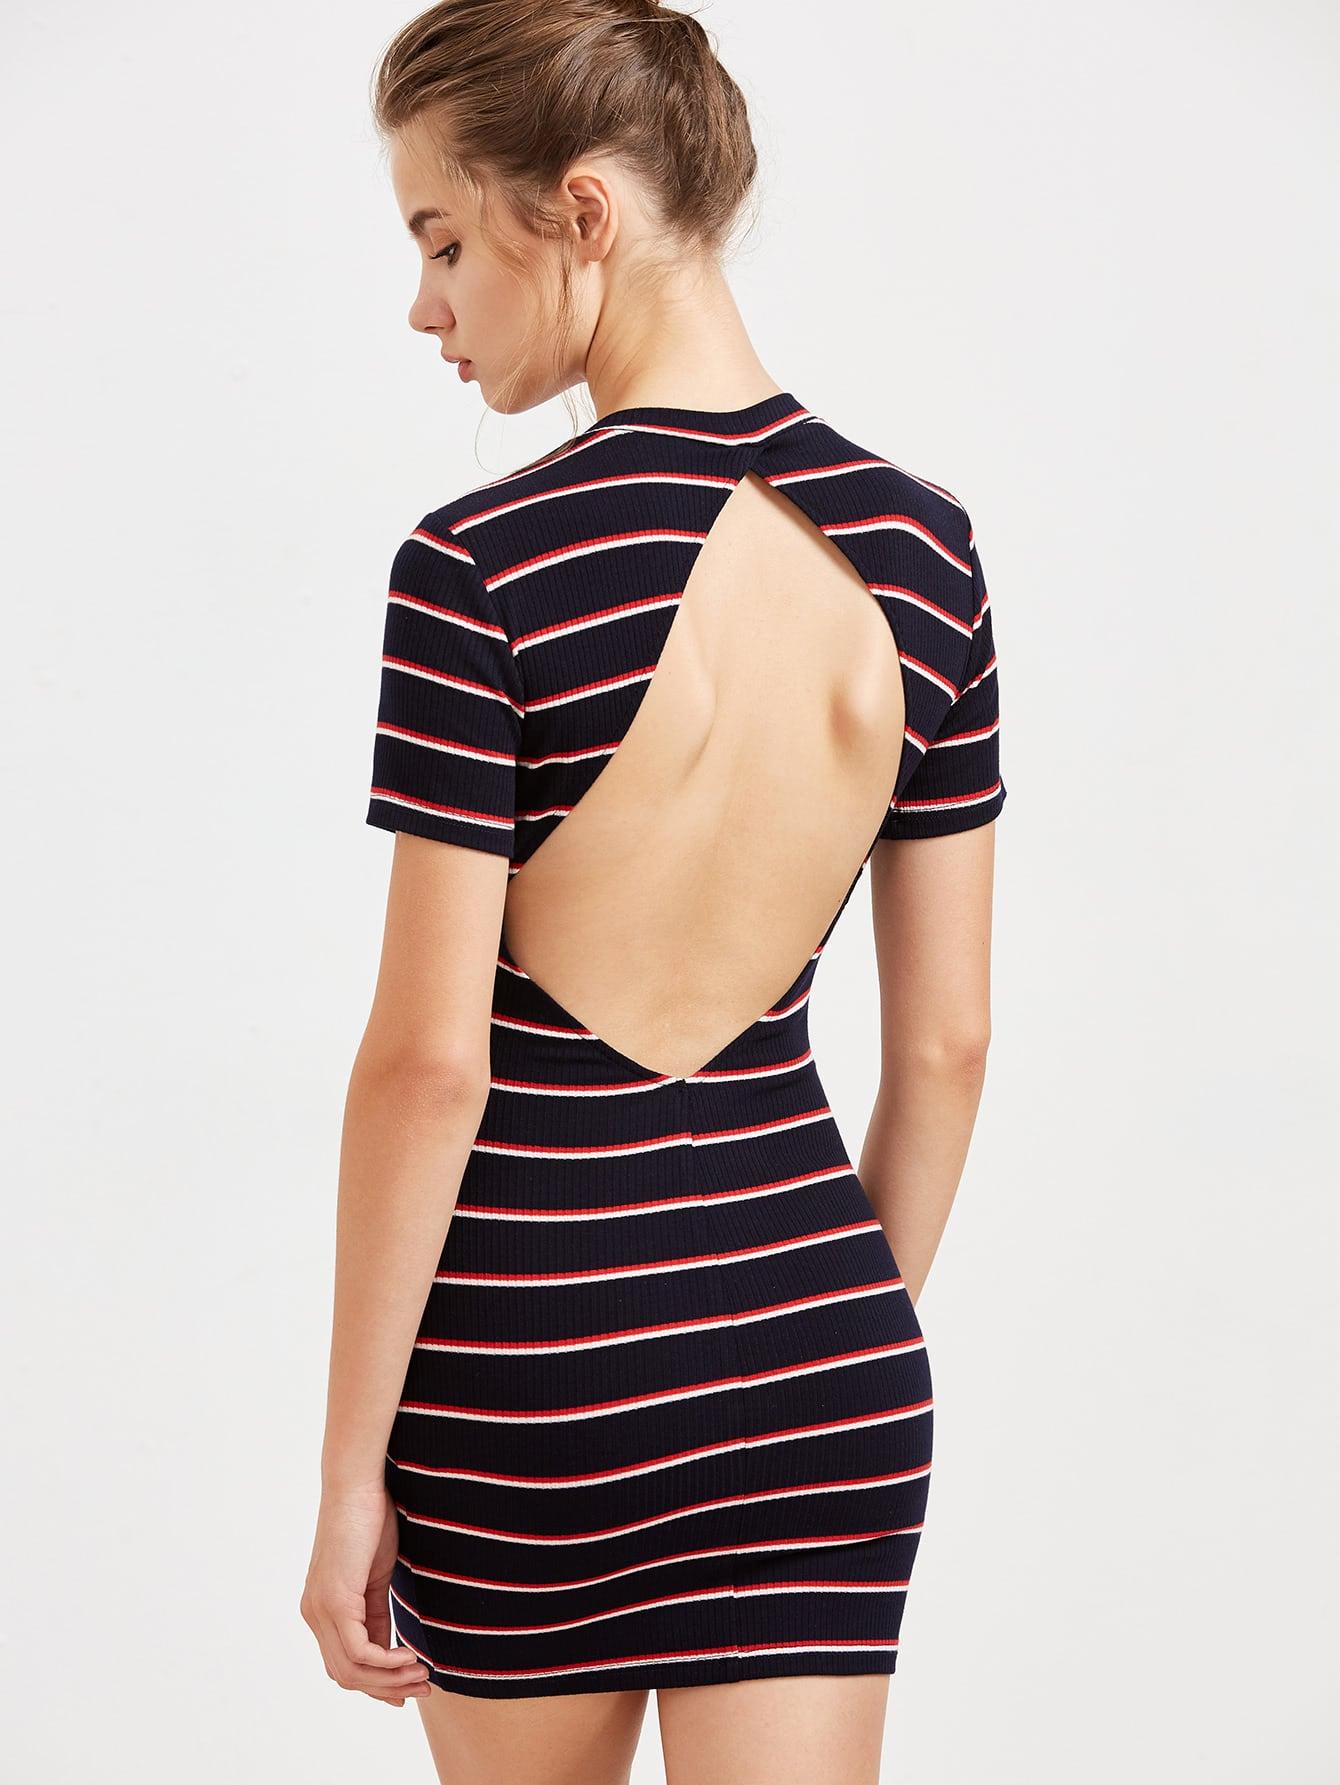 Navy Striped Open Back Ribbed Bodycon Dress dress170213717